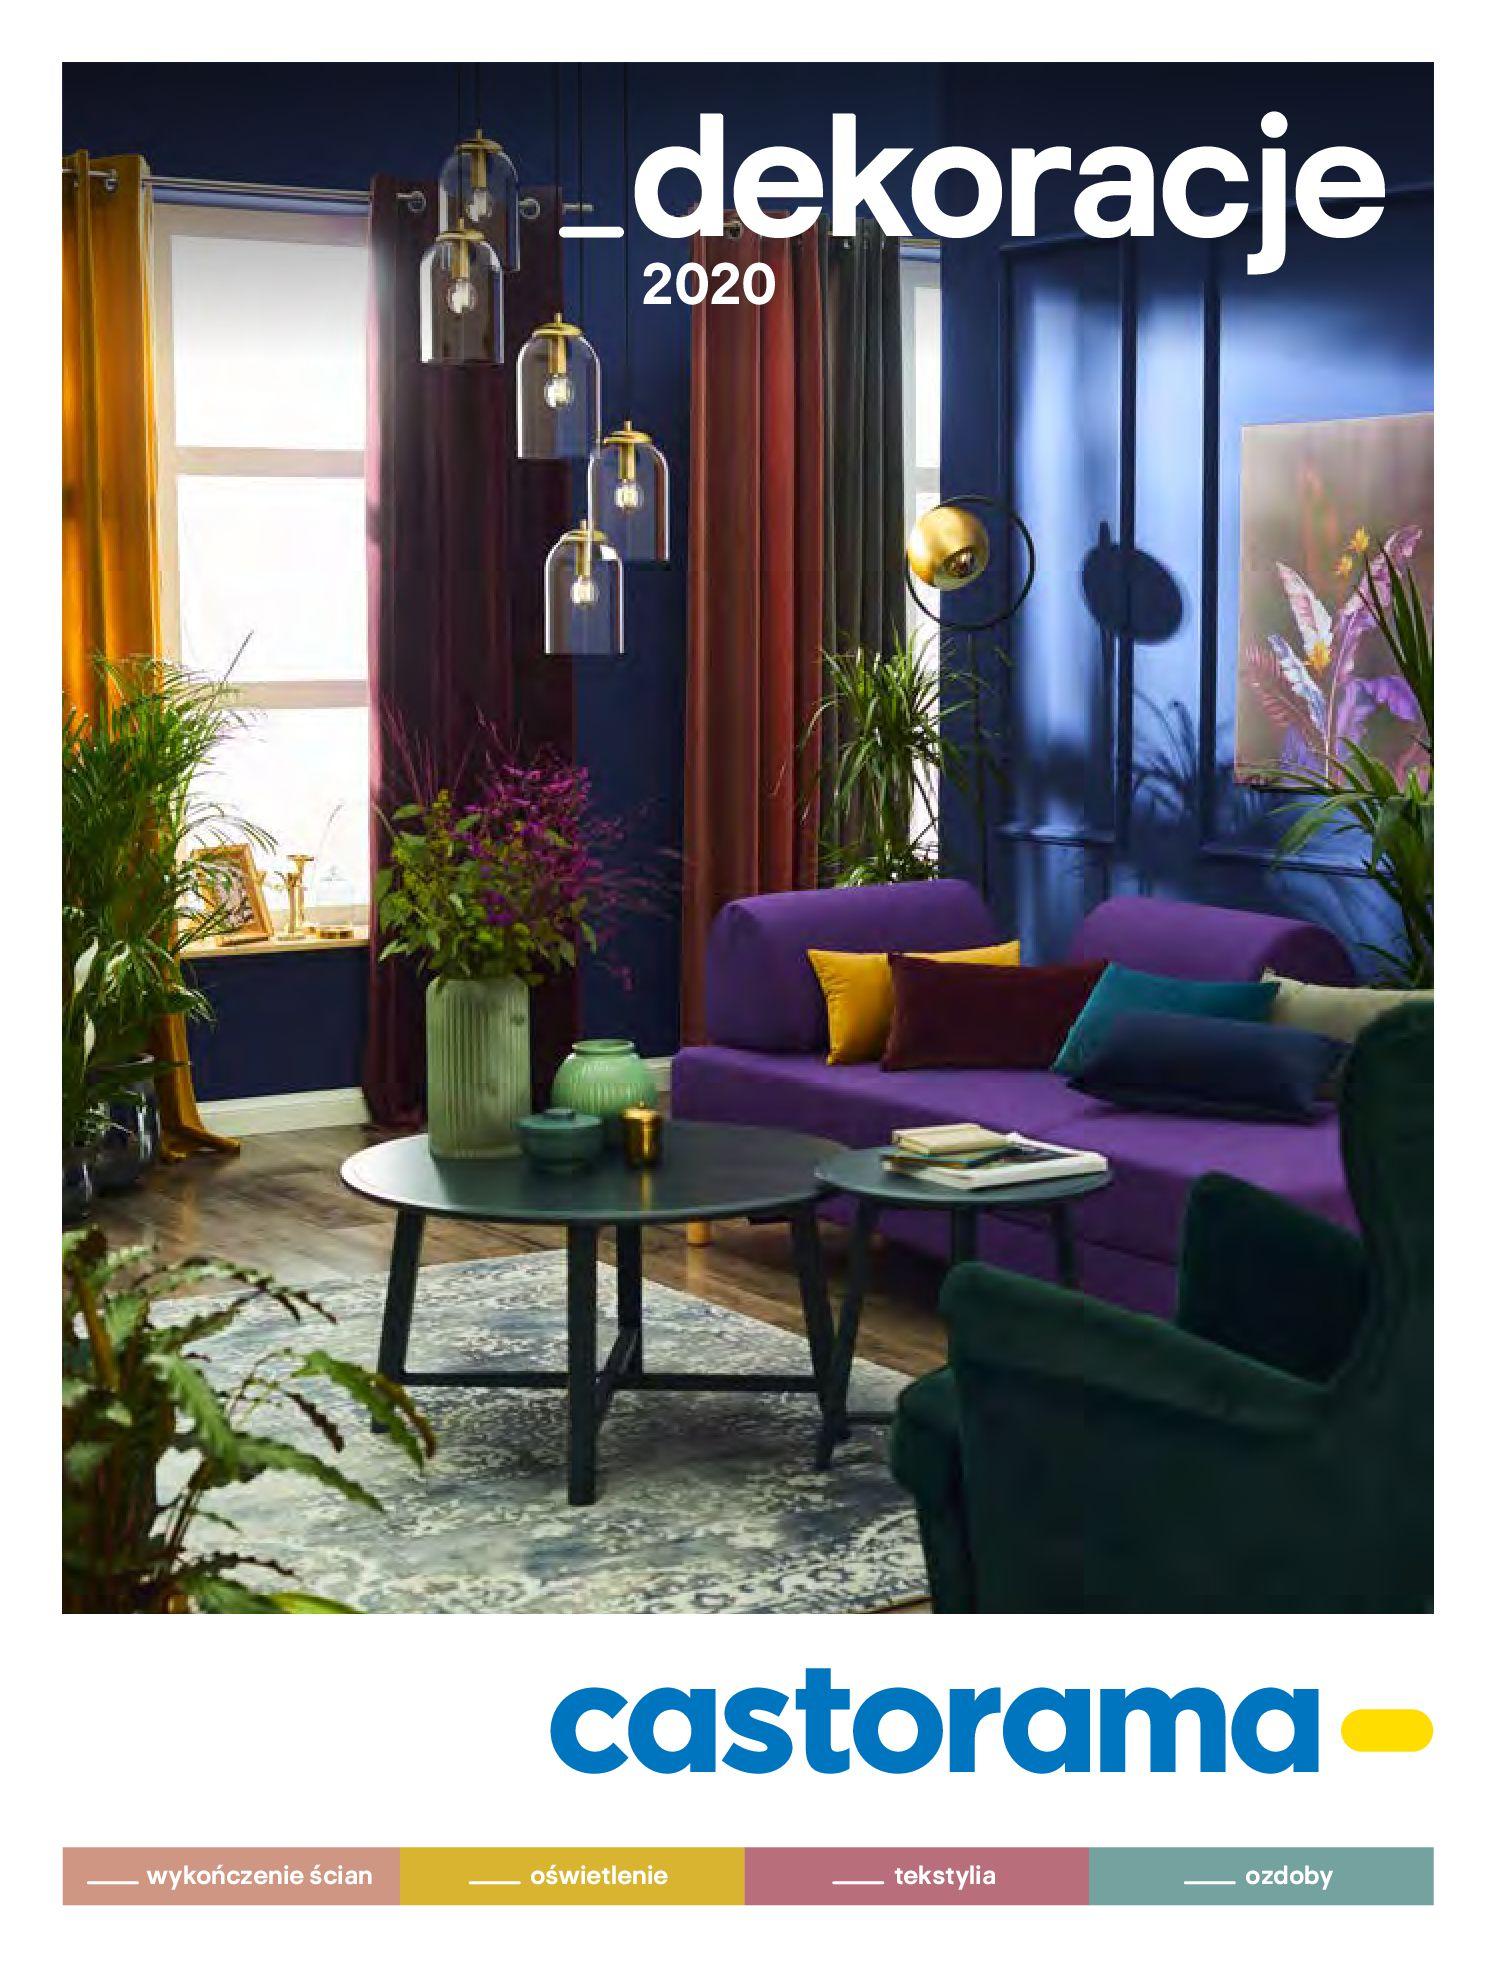 Gazetka Castorama - Katalog Dekoracje-22.10.2020-31.12.2020-page-1